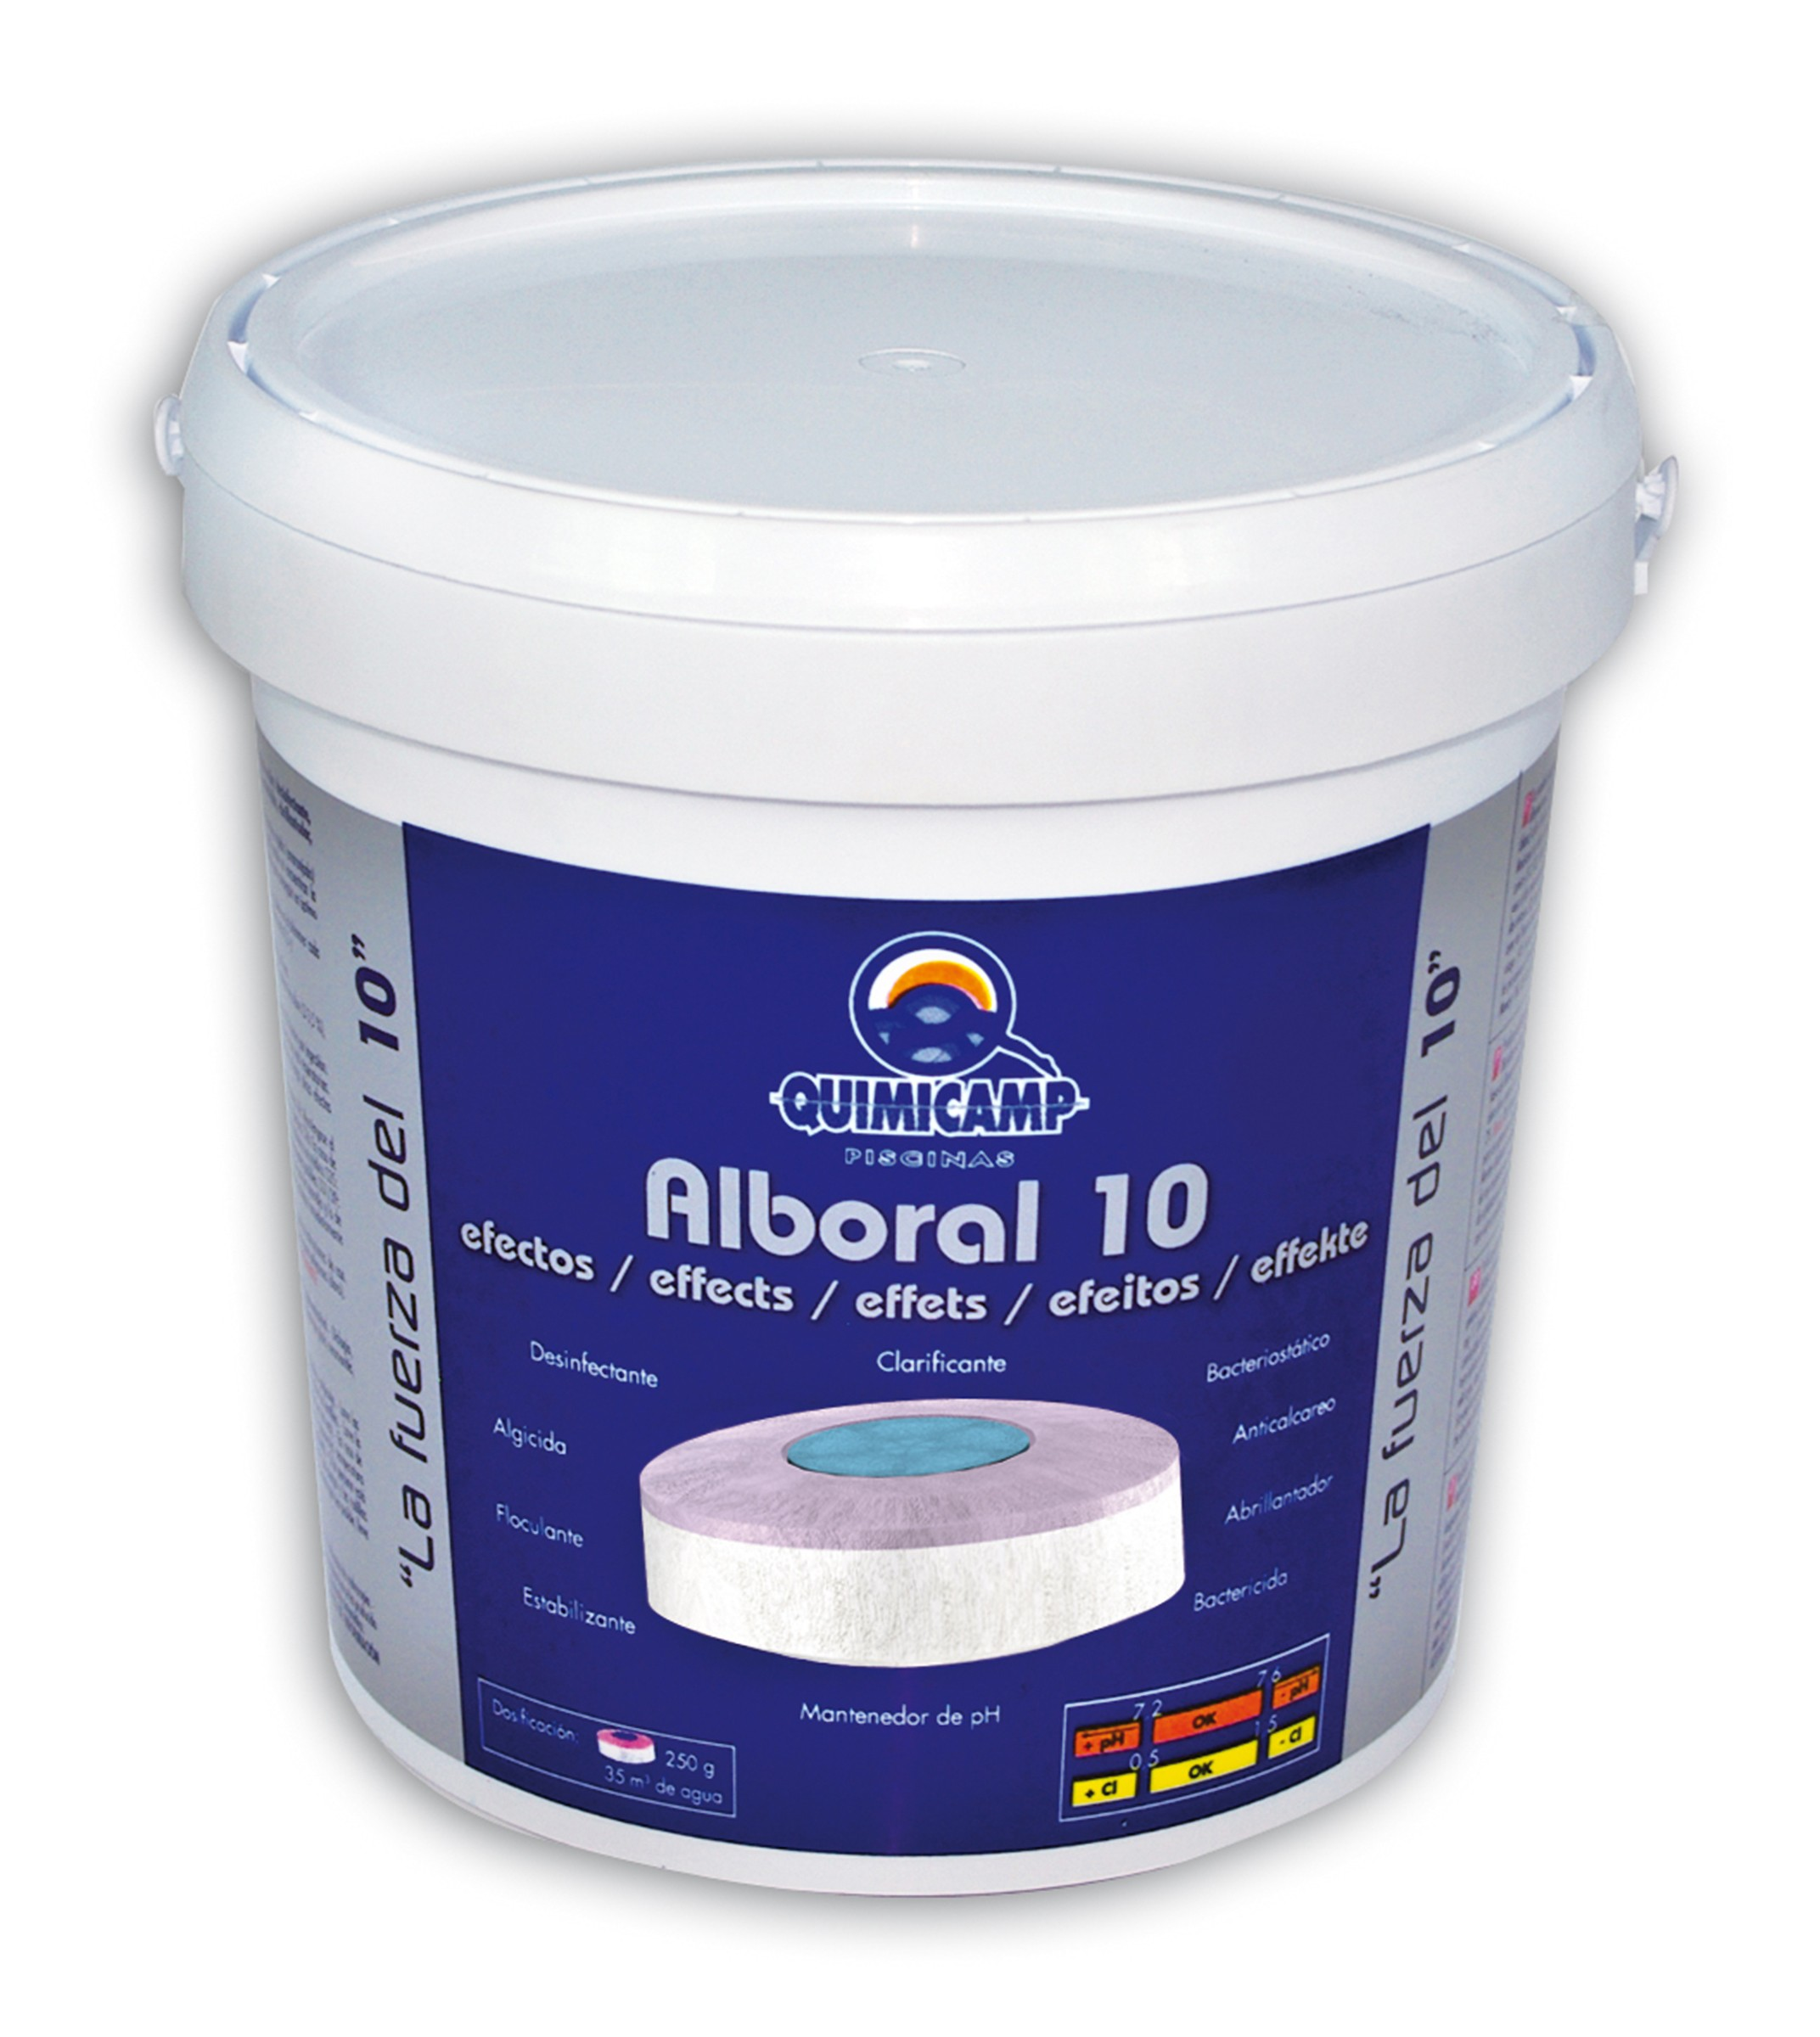 Quimicamp alboral tabletas 10 efectos piscinas ferromar for Quimicamp piscinas